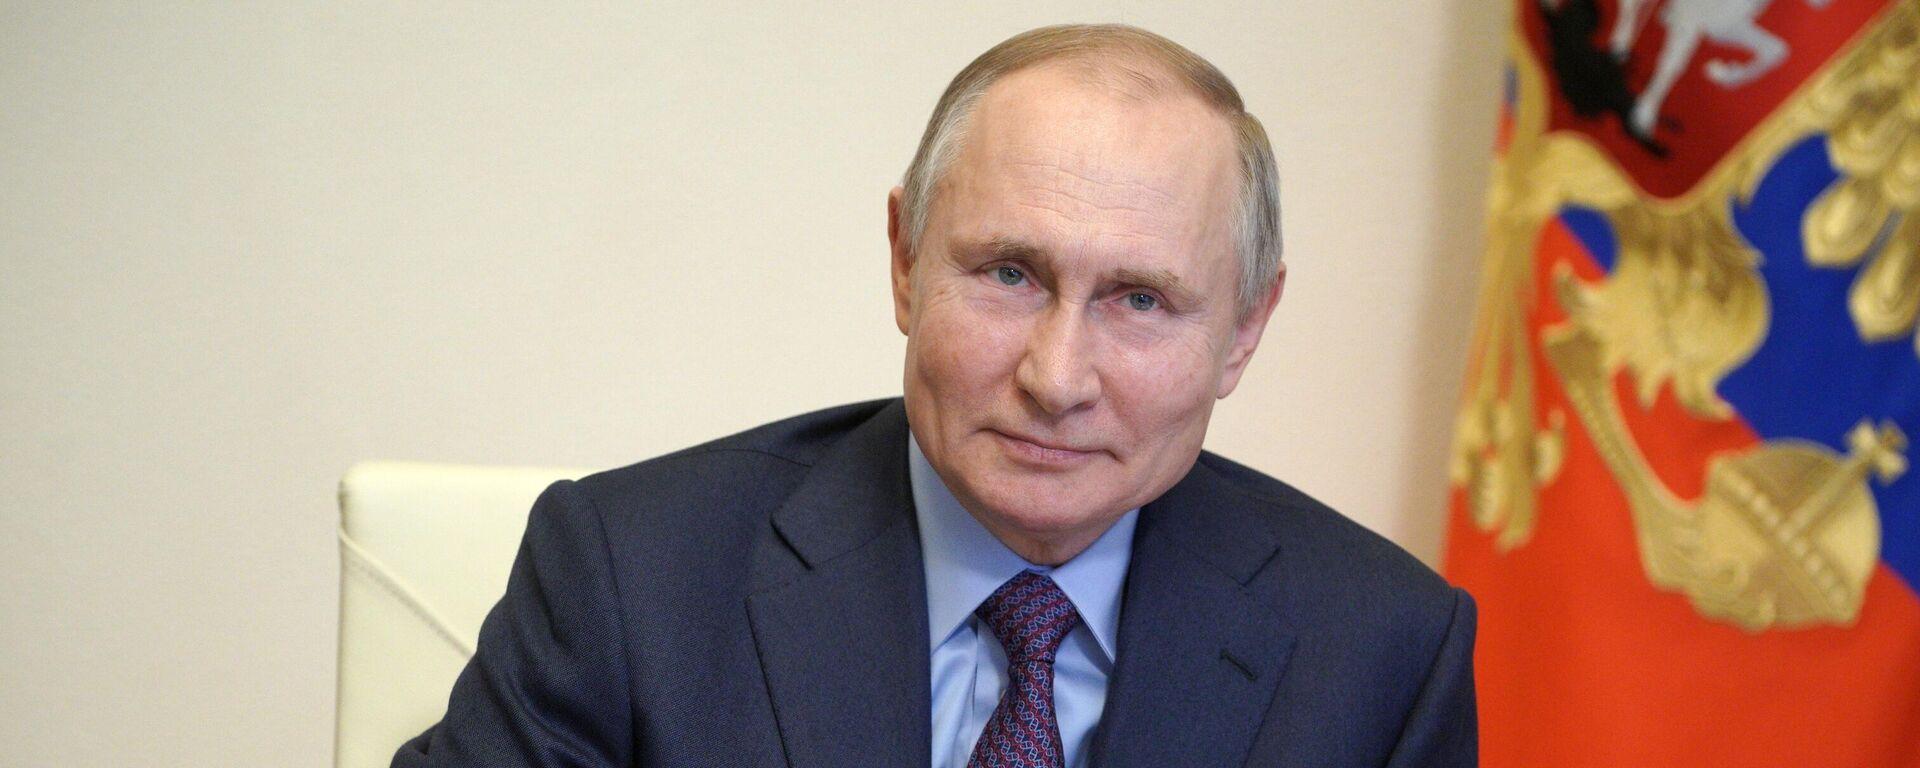 Vladímir Putin, presidente de Rusia - Sputnik Mundo, 1920, 10.05.2021